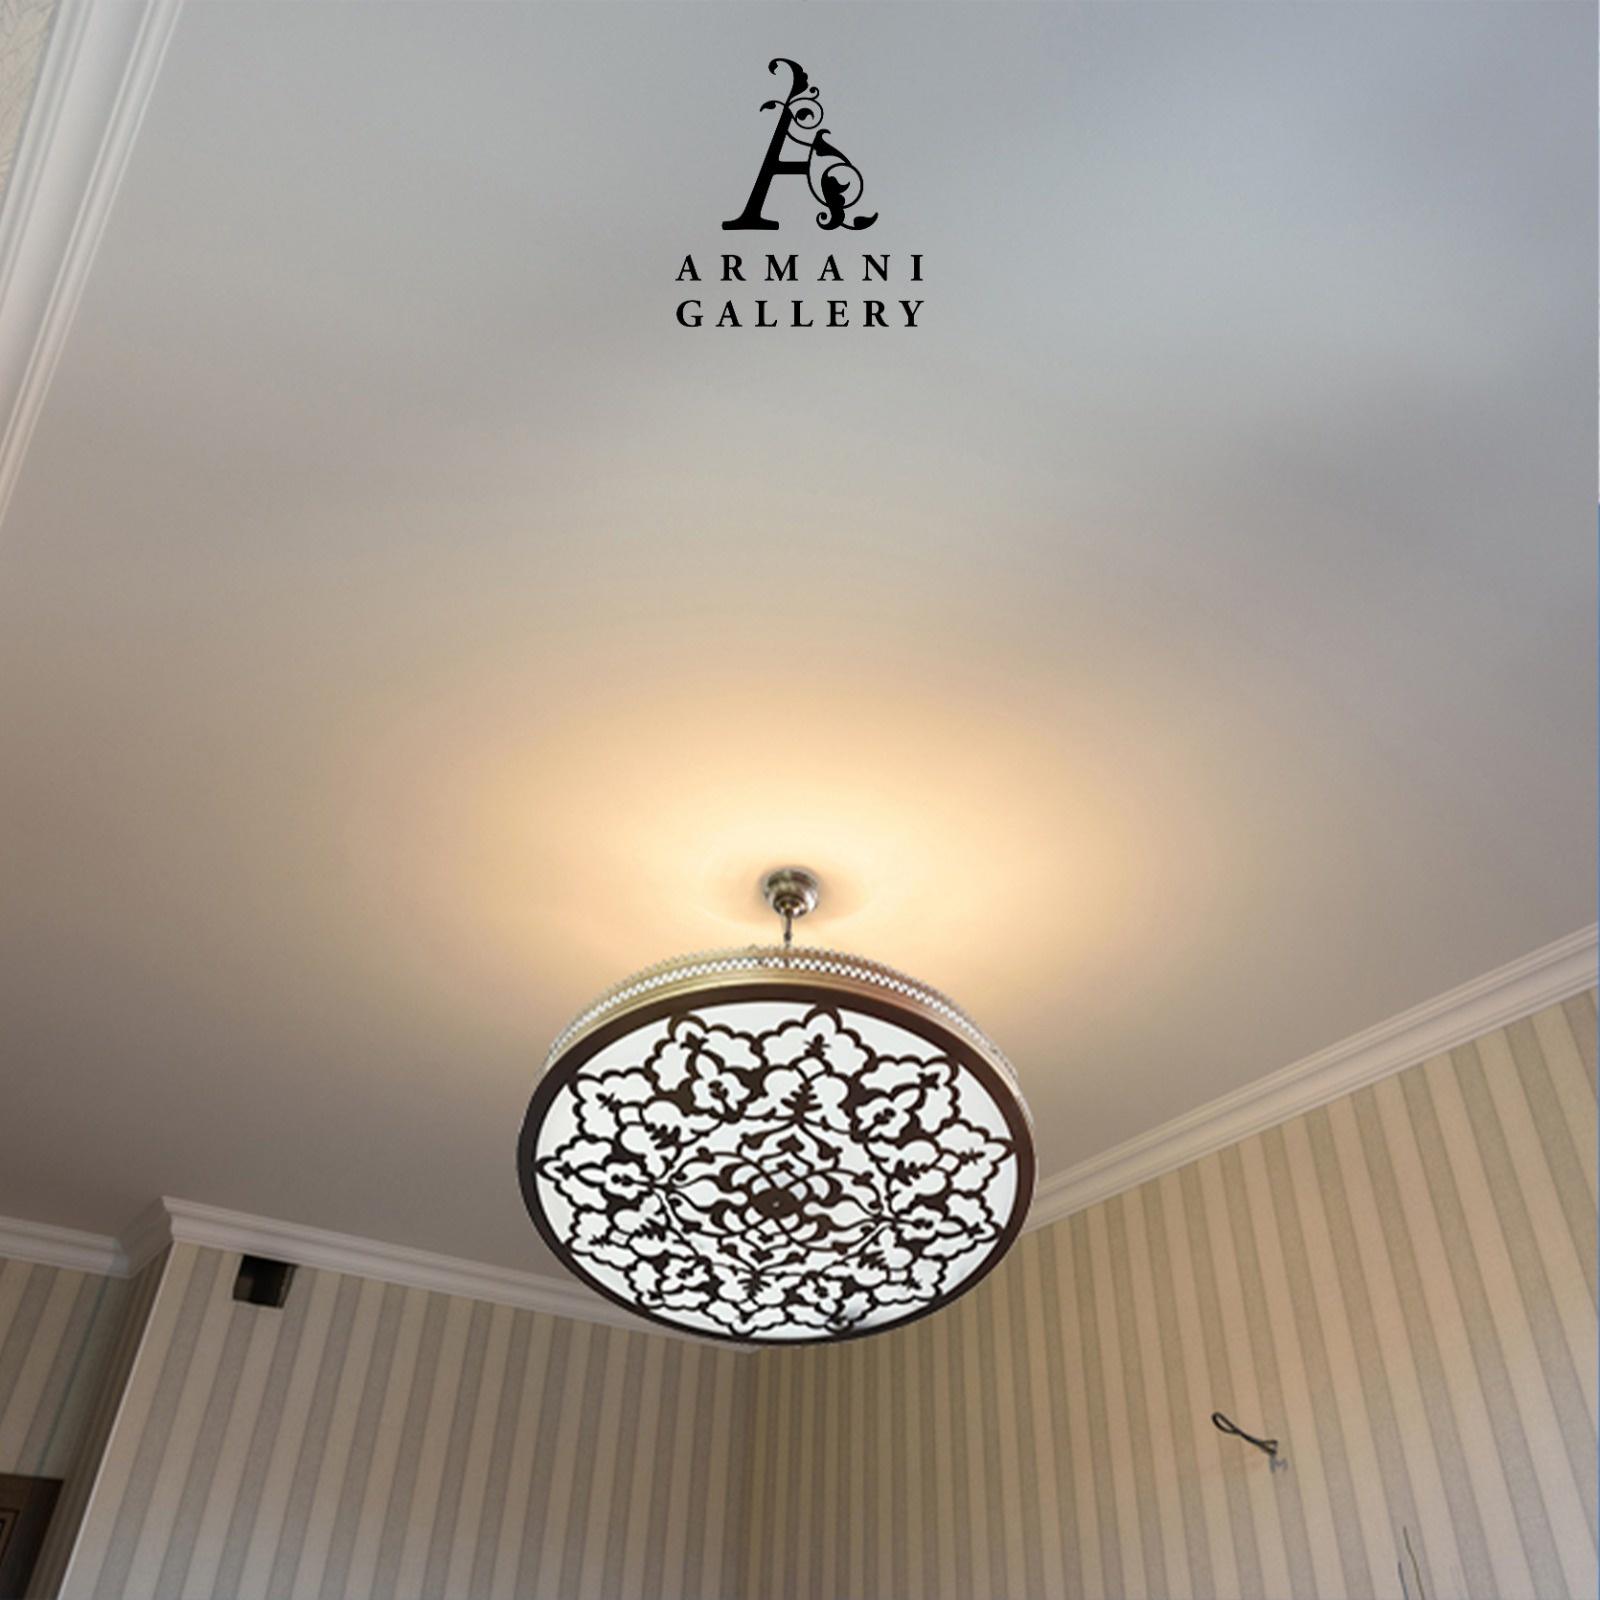 Buy Turkish Ceiling Light SR-29